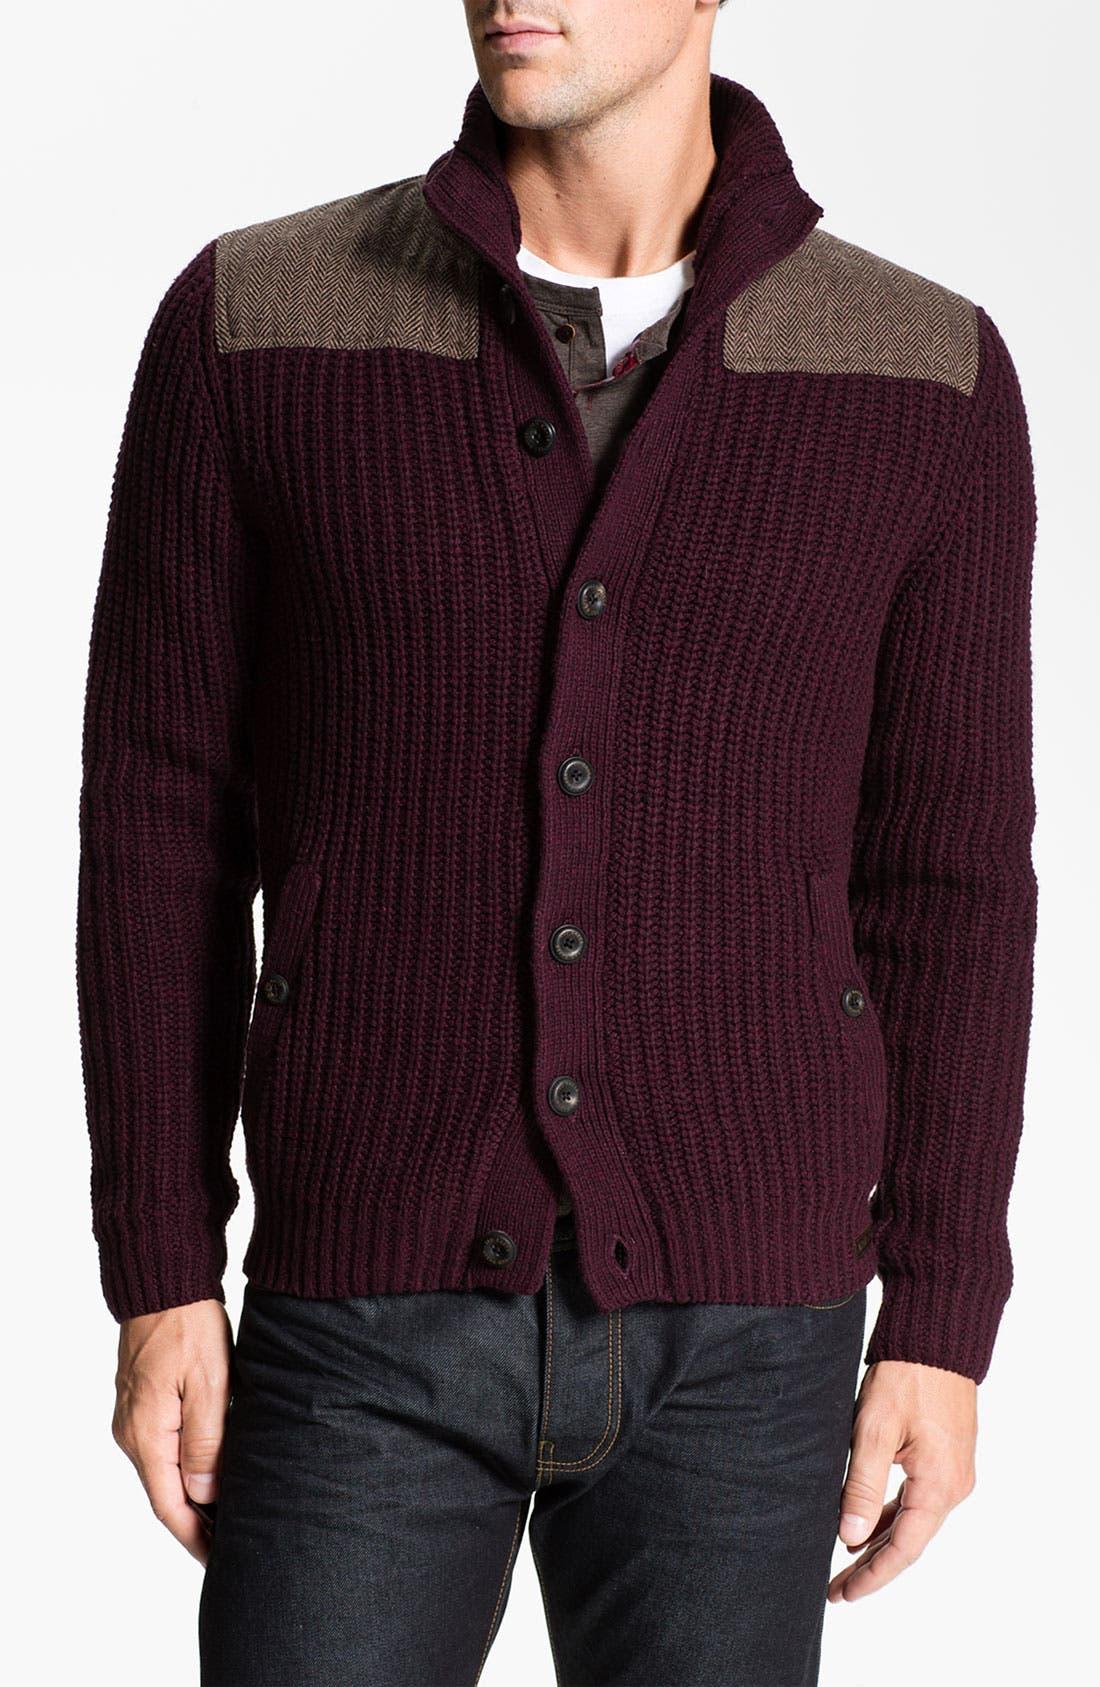 Alternate Image 1 Selected - Ted Baker London 'Princiz' Knit Cardigan